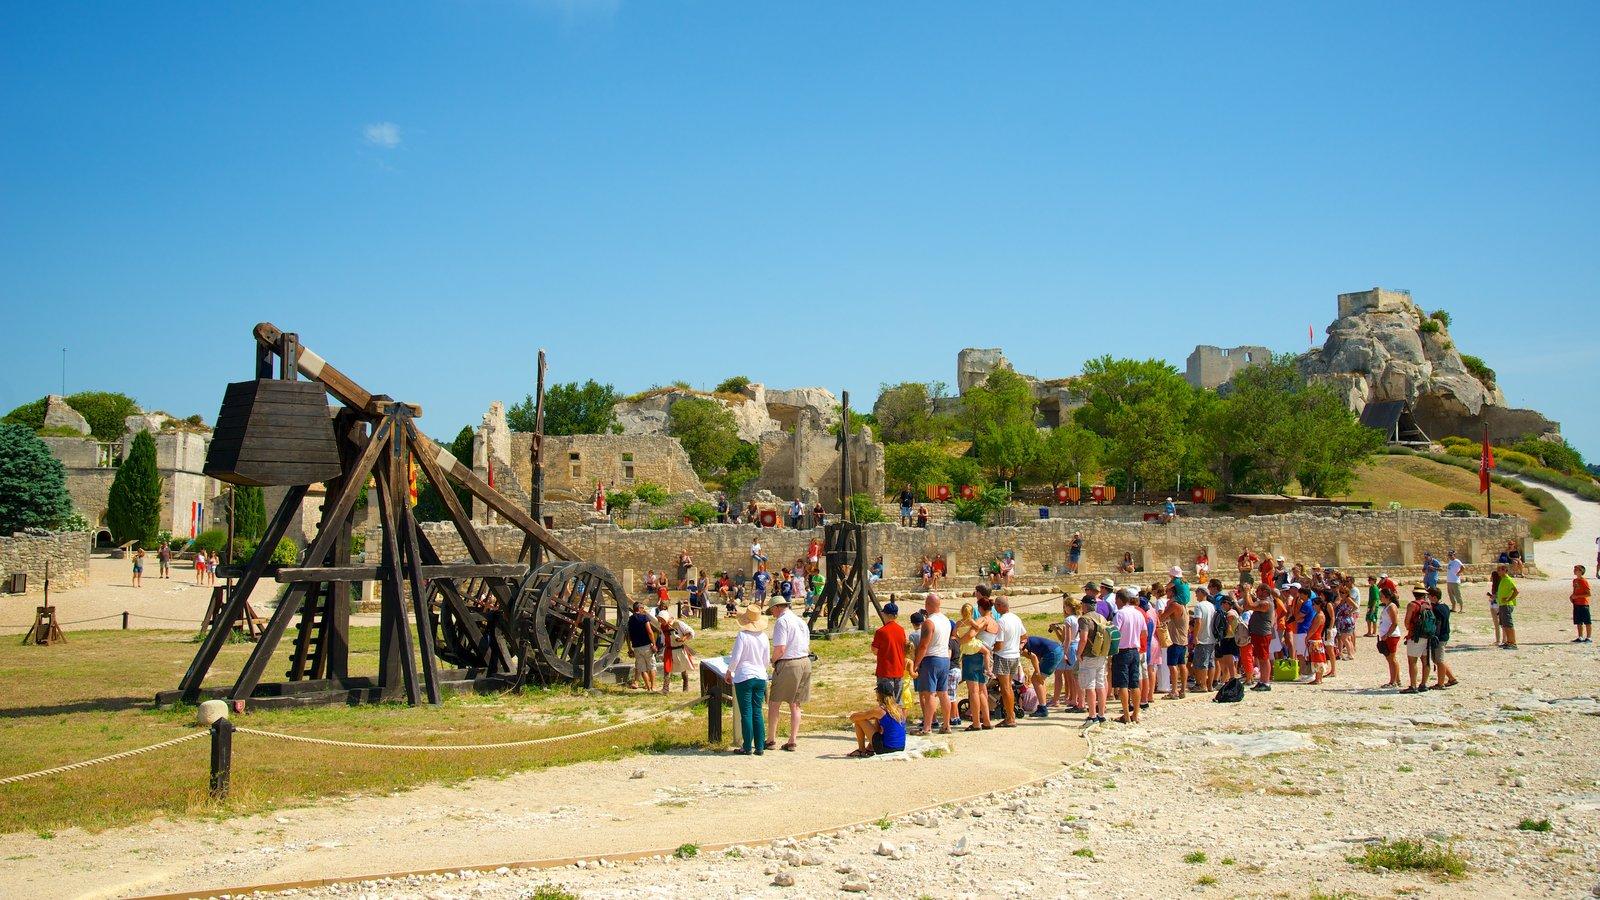 Chateau des Baux que inclui elementos de patrimônio, um castelo e arquitetura de patrimônio